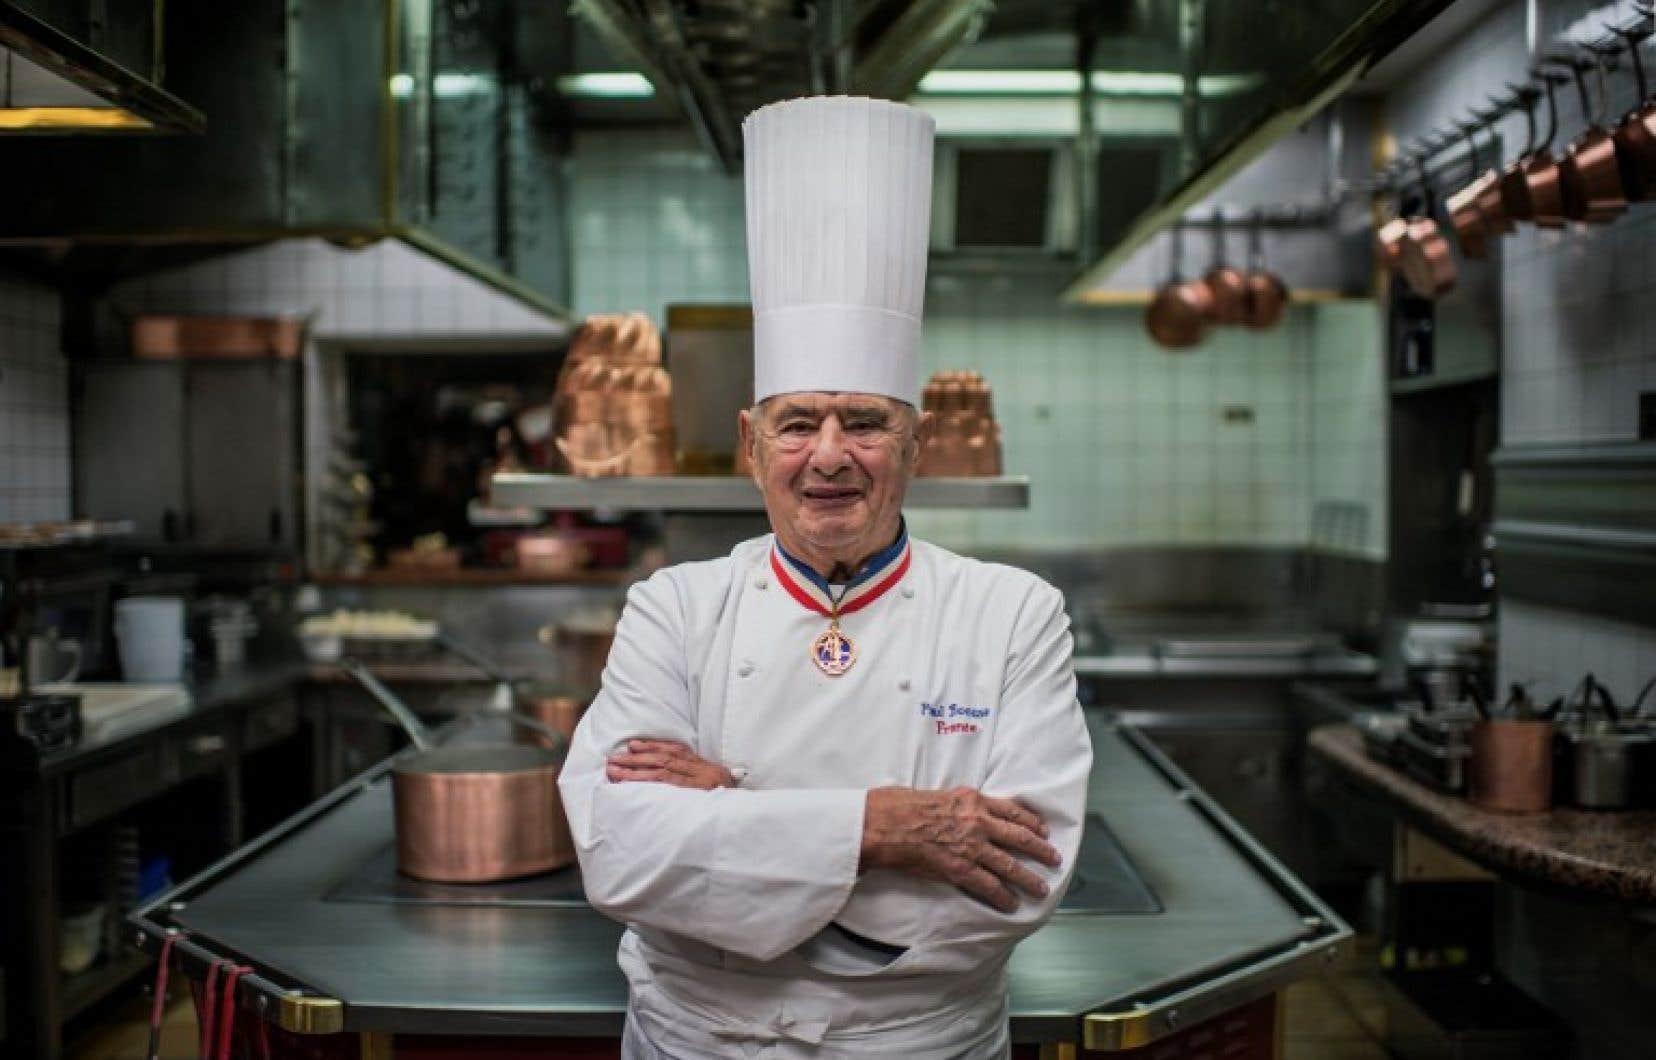 Le chef cuisinier, Paul Bocuse, en 2012